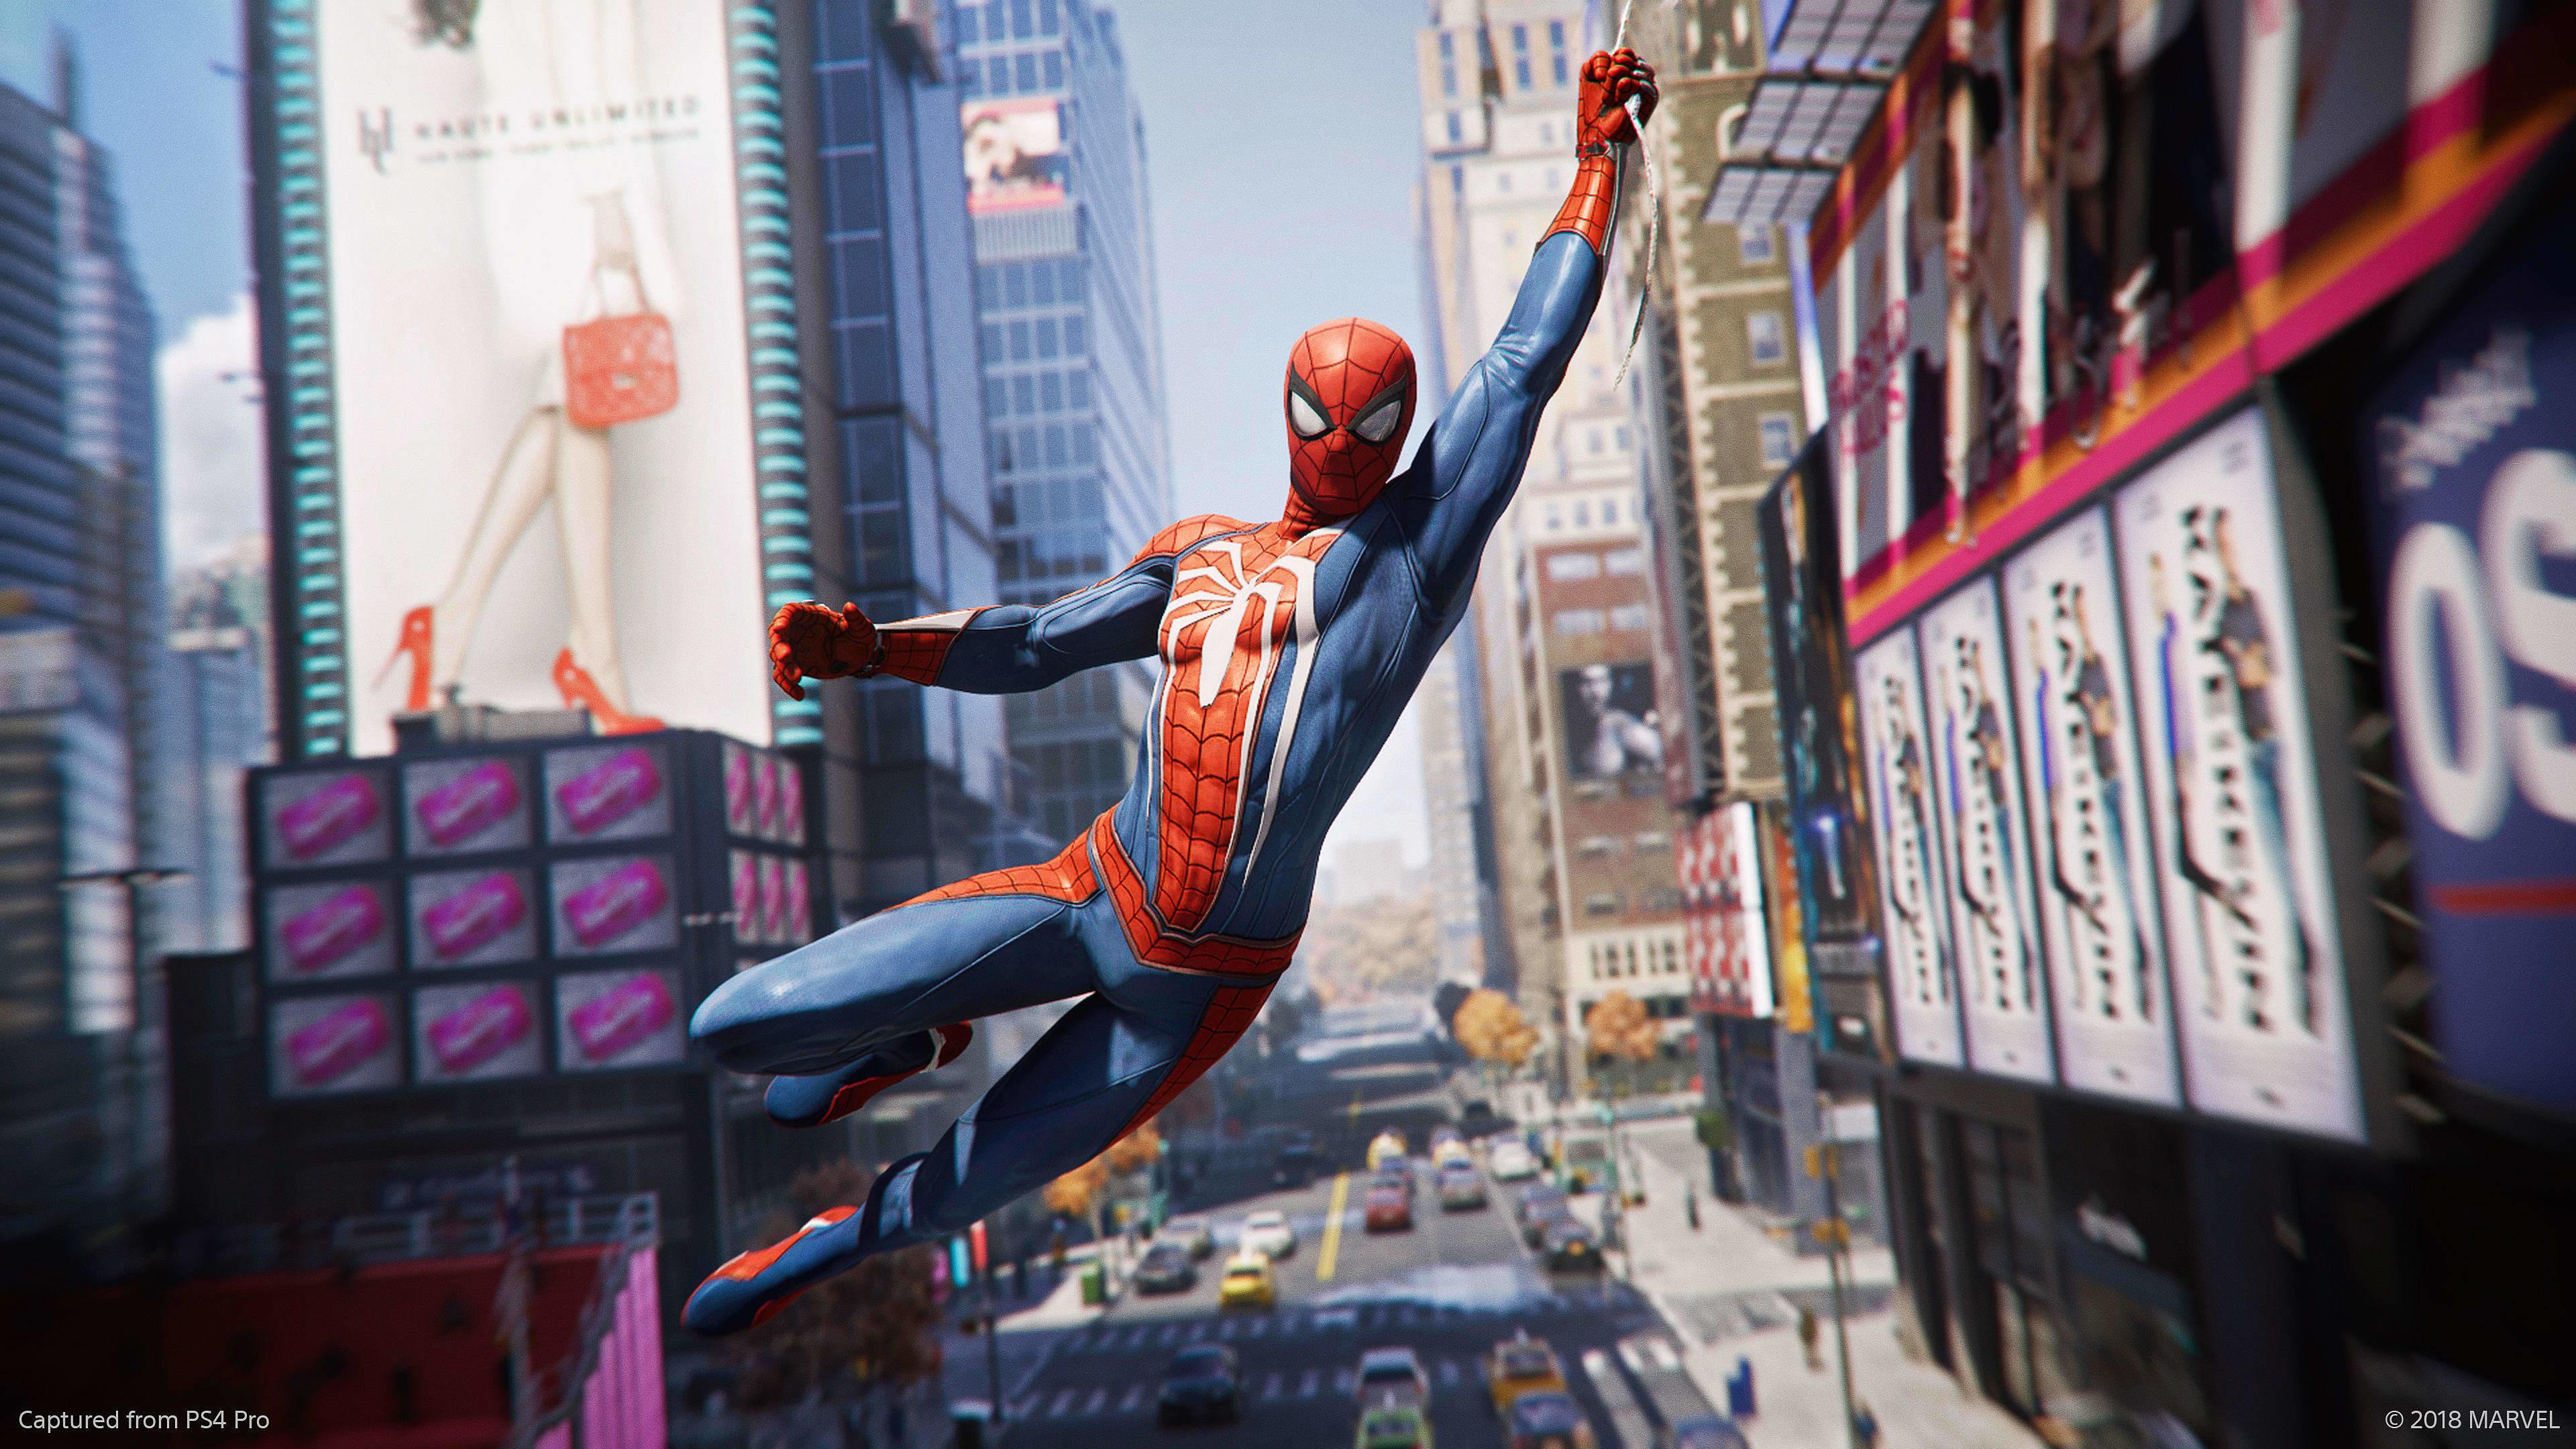 Download 3840x2160 Wallpaper Spider Man Ps4 Video Game Hanging 2018 4k Uhd 16 9 Widescreen